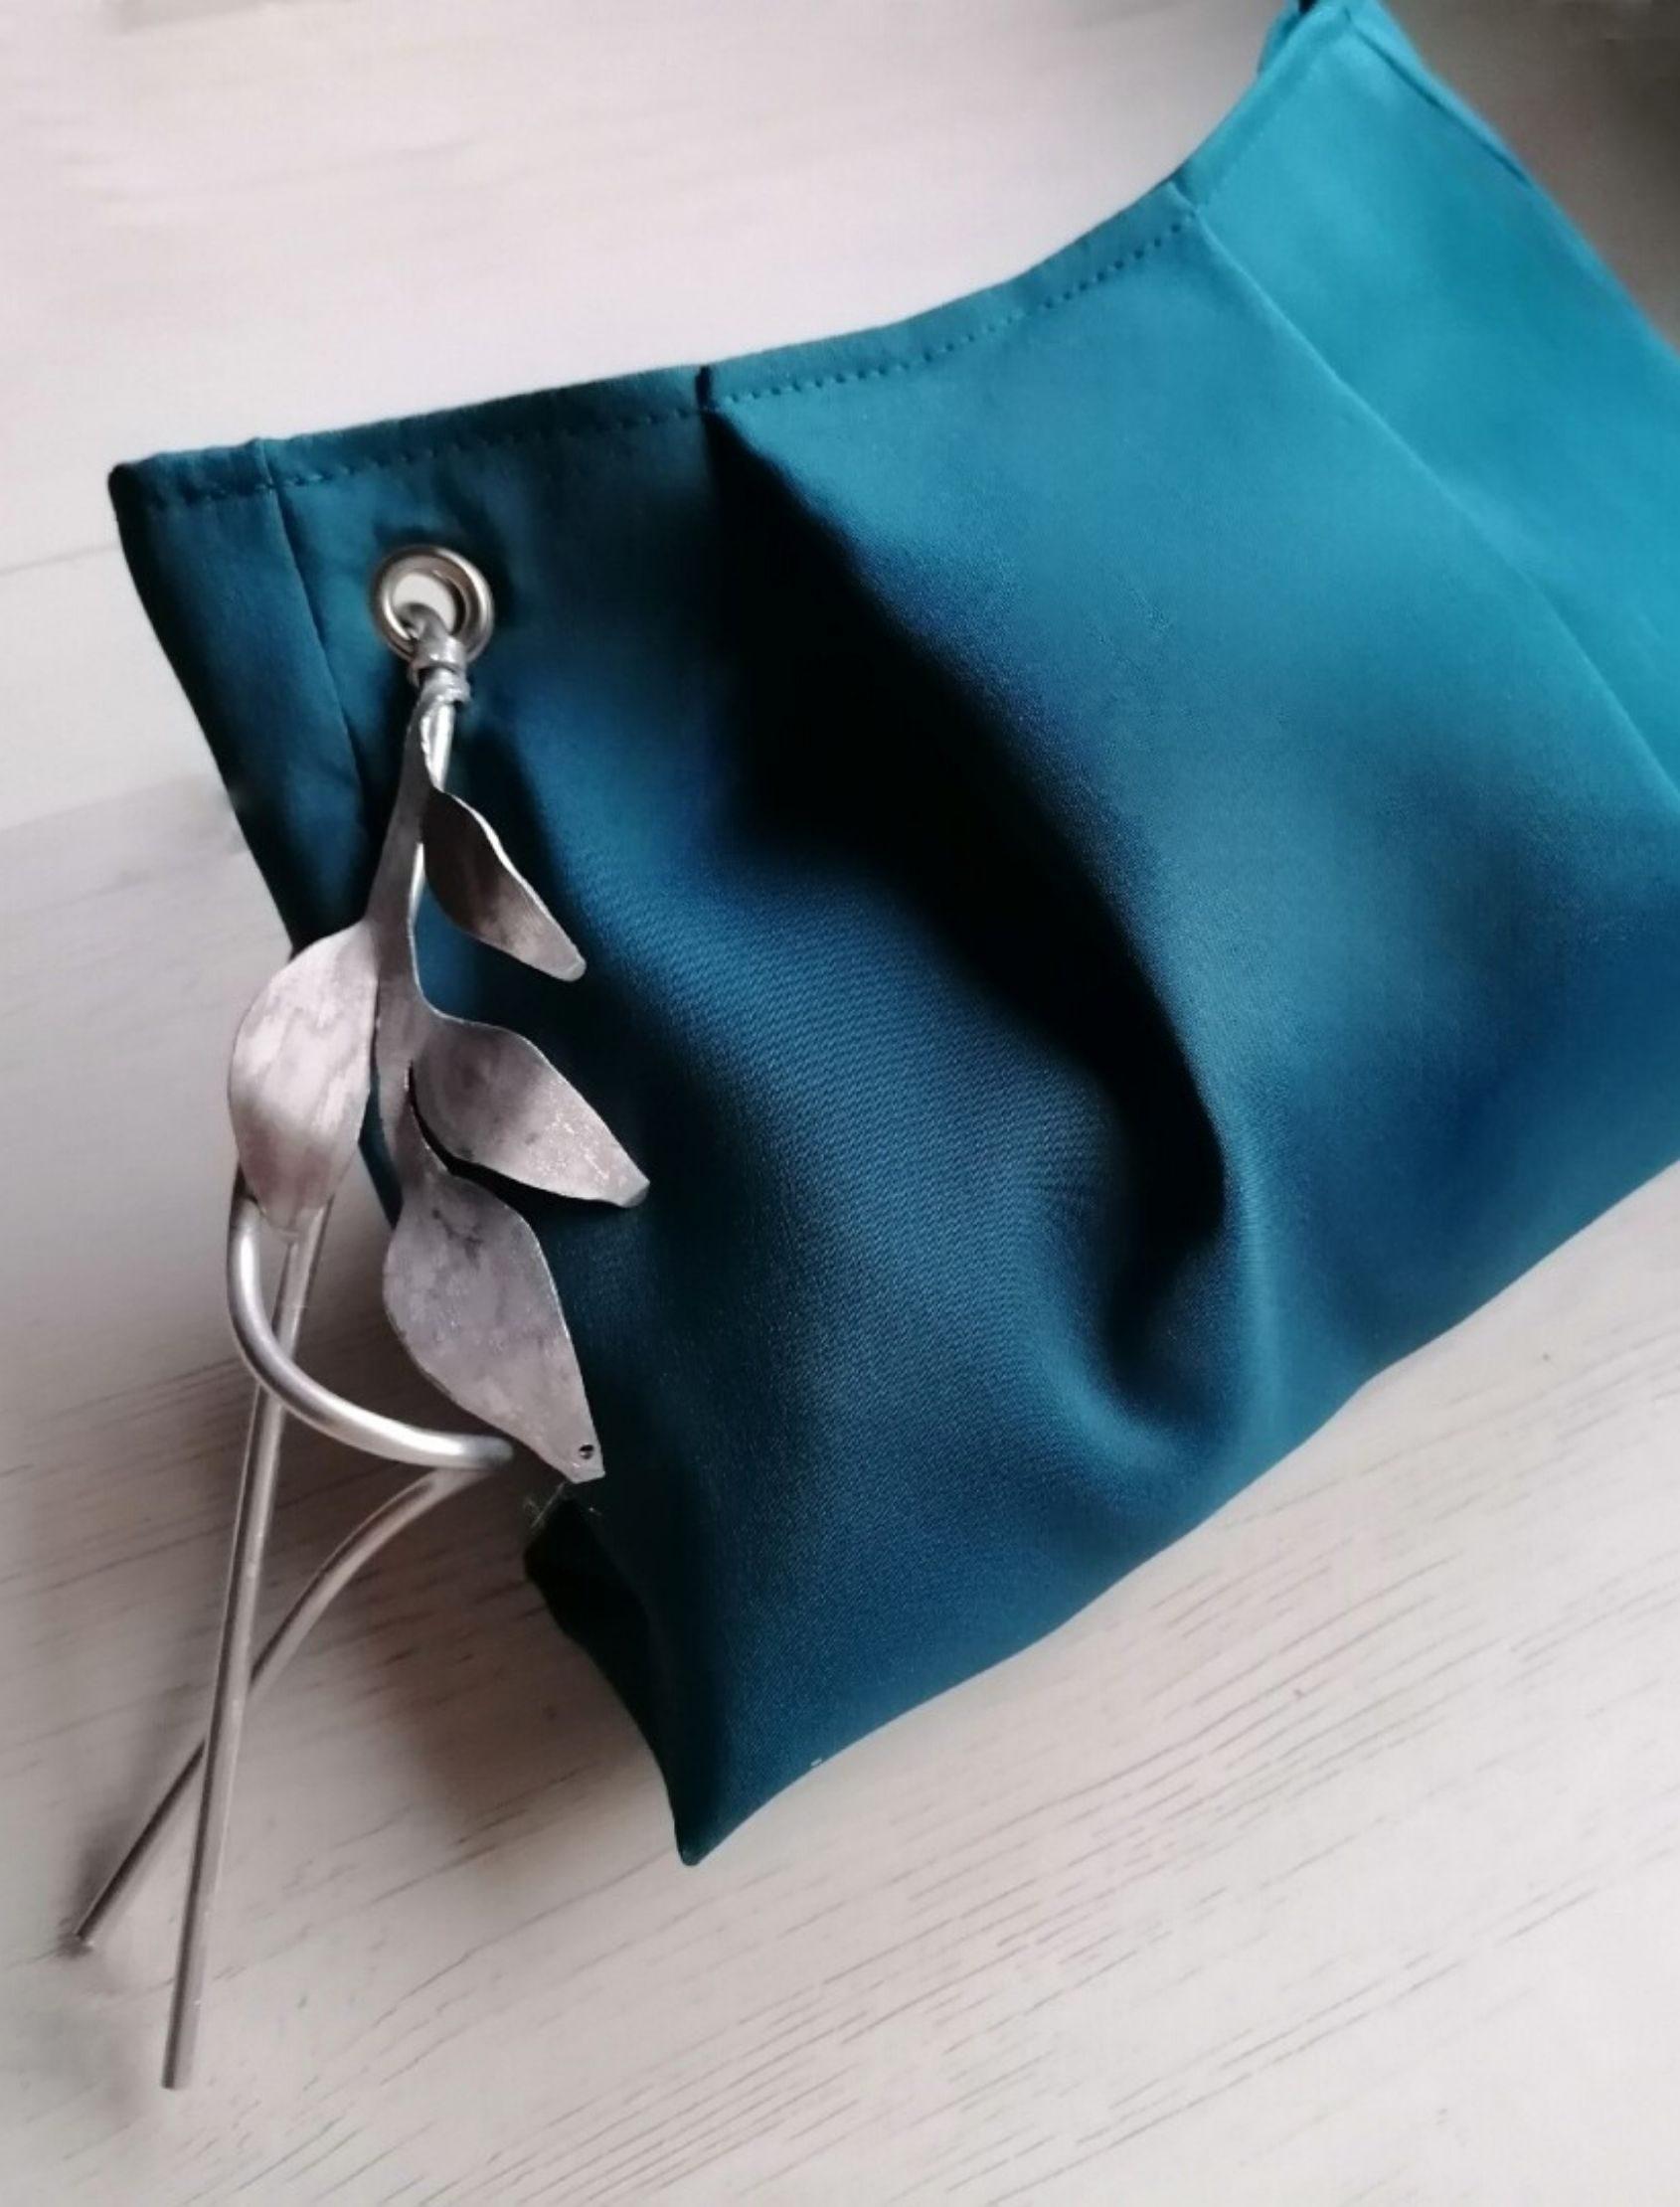 clutch seda en azul petróleo con detalle de abalorio en plata